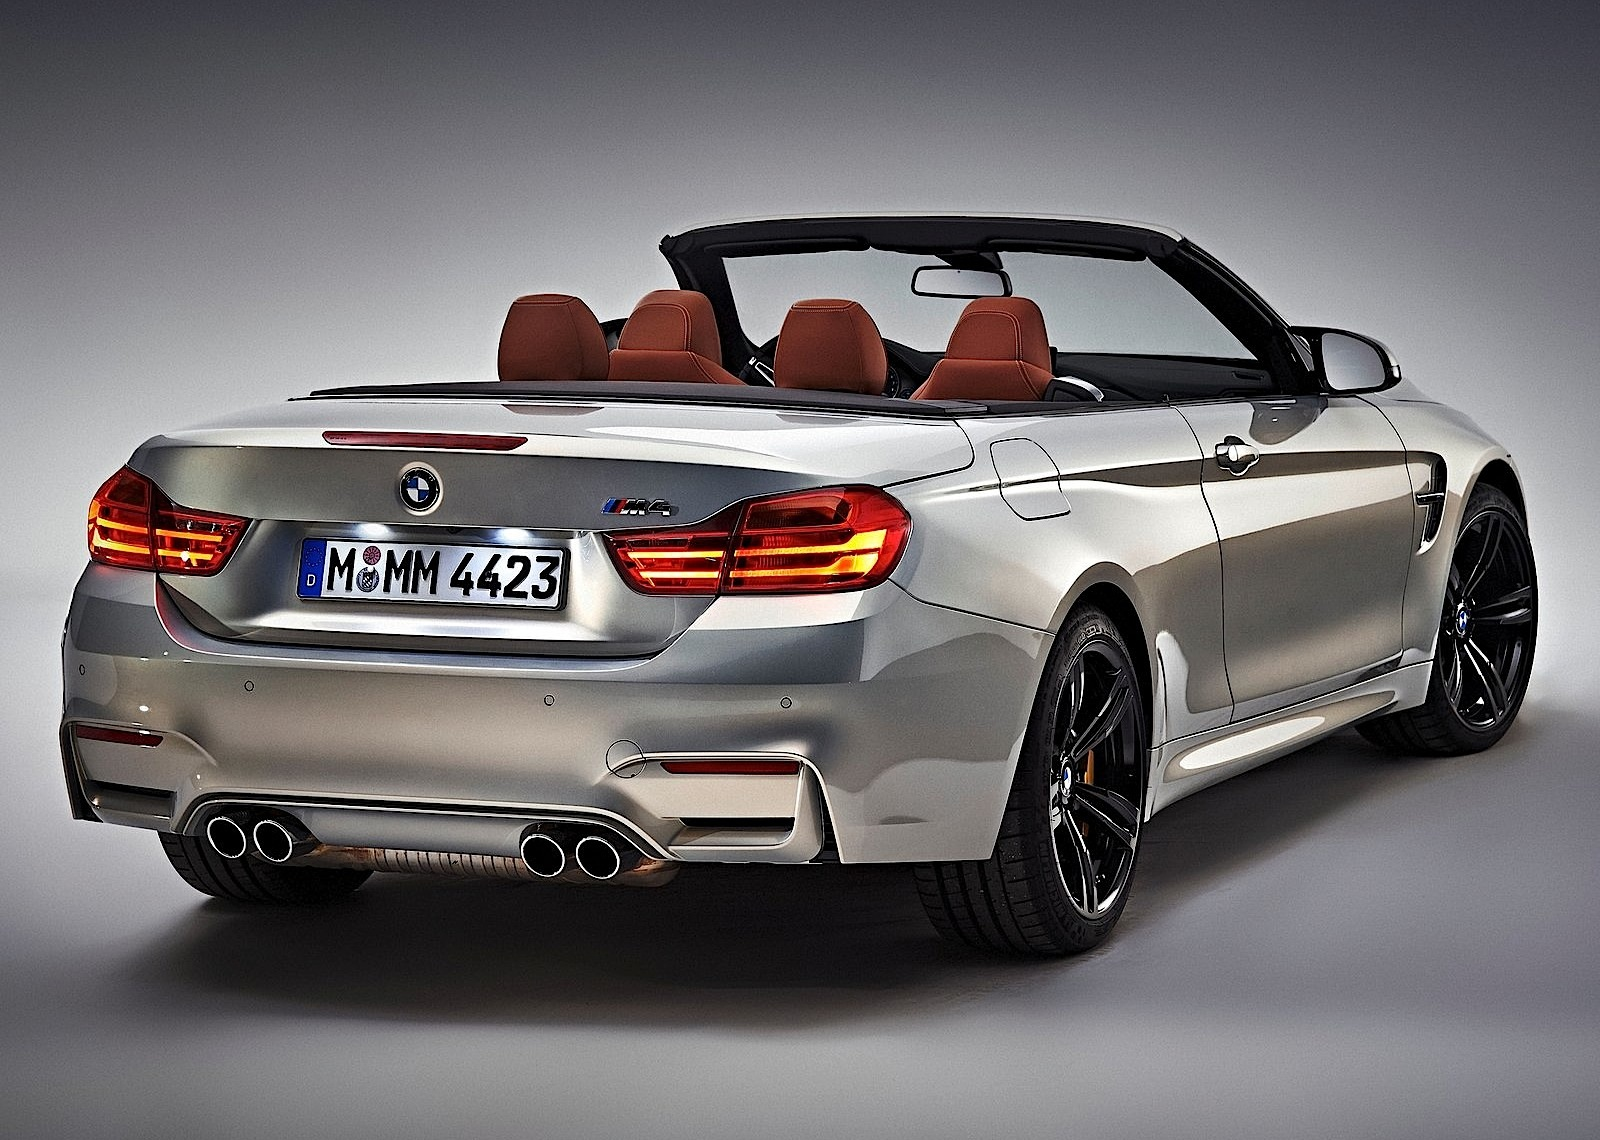 bmw m4 convertible specs 2014 2015 2016 2017 autoevolution. Black Bedroom Furniture Sets. Home Design Ideas